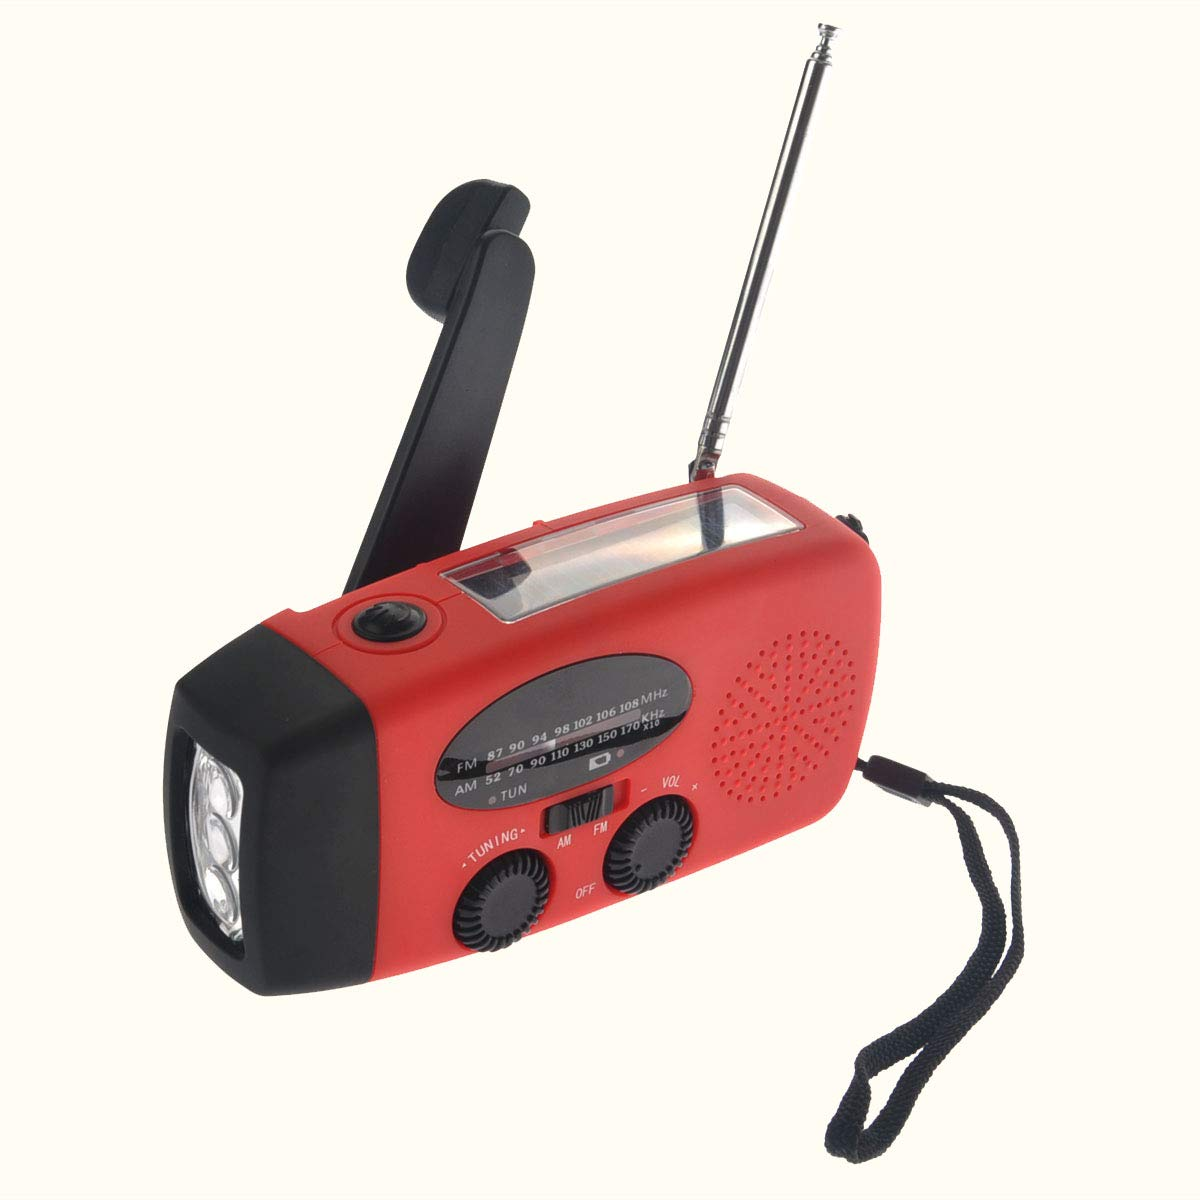 VOSAREA Emergency Solar Crank AM FM Camp Radio with LED Flashlight USB Output Port(Red) by VOSAREA (Image #9)